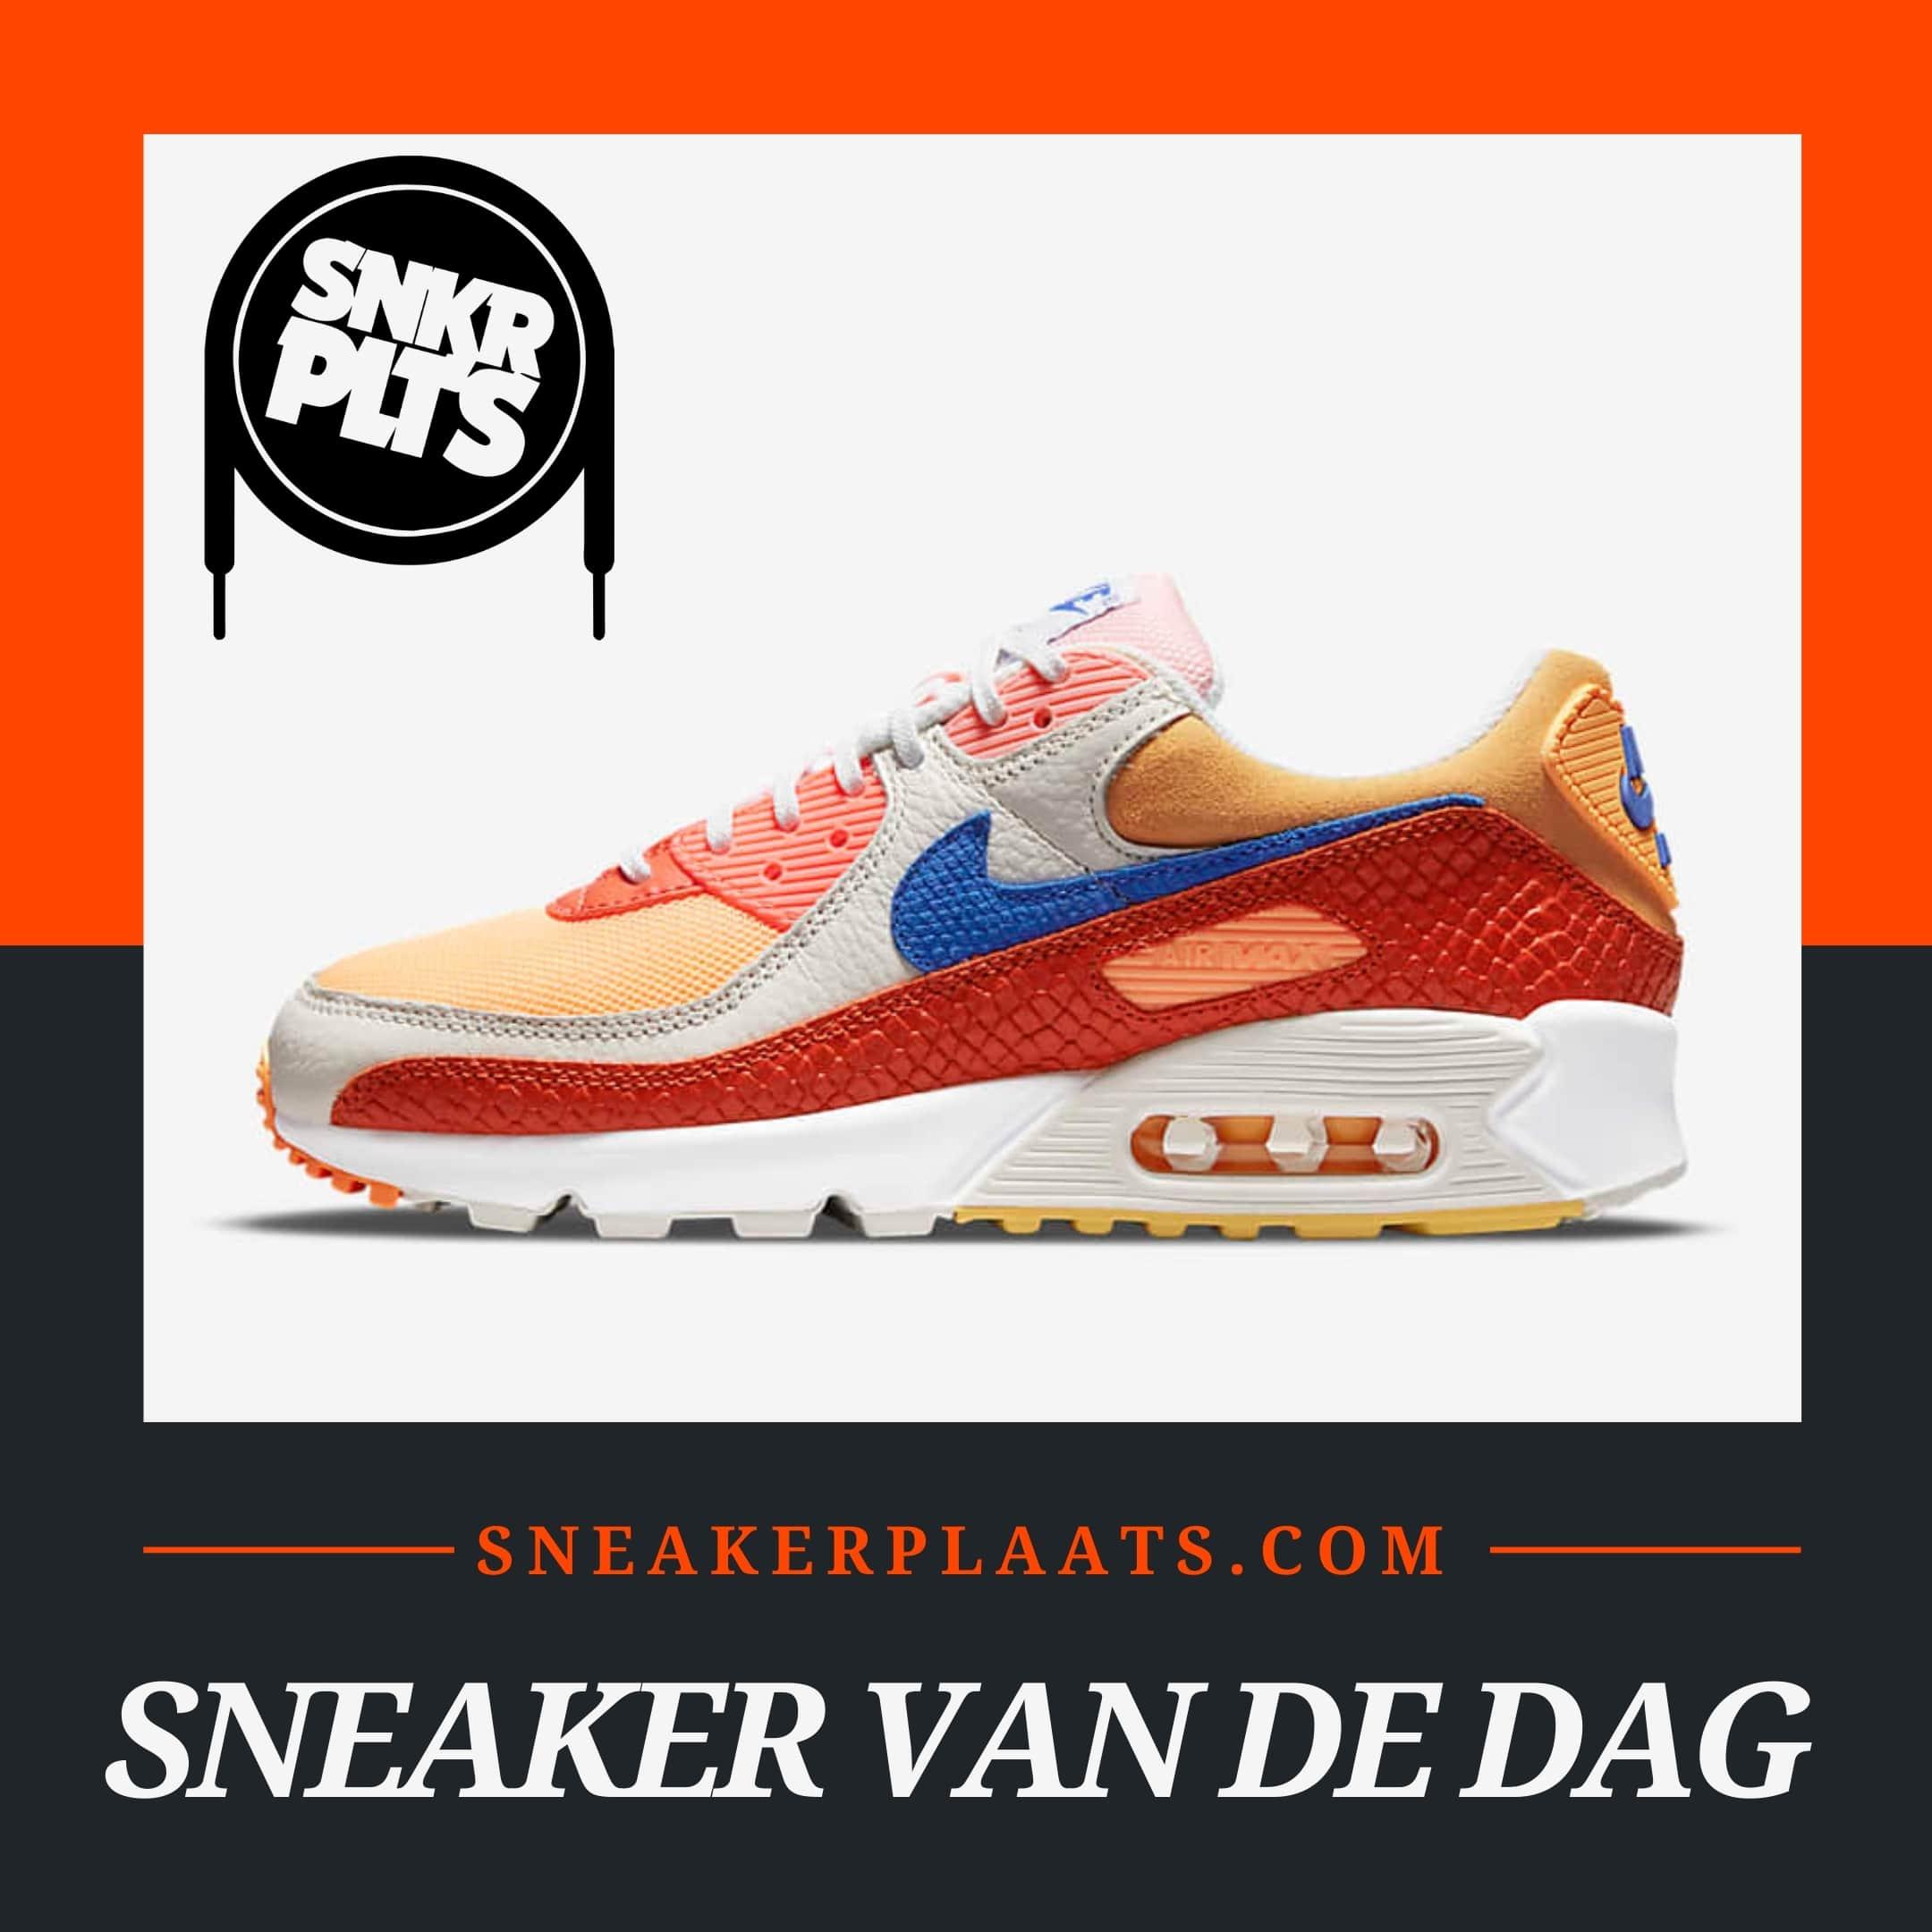 Nike Air Max 90 Sunset